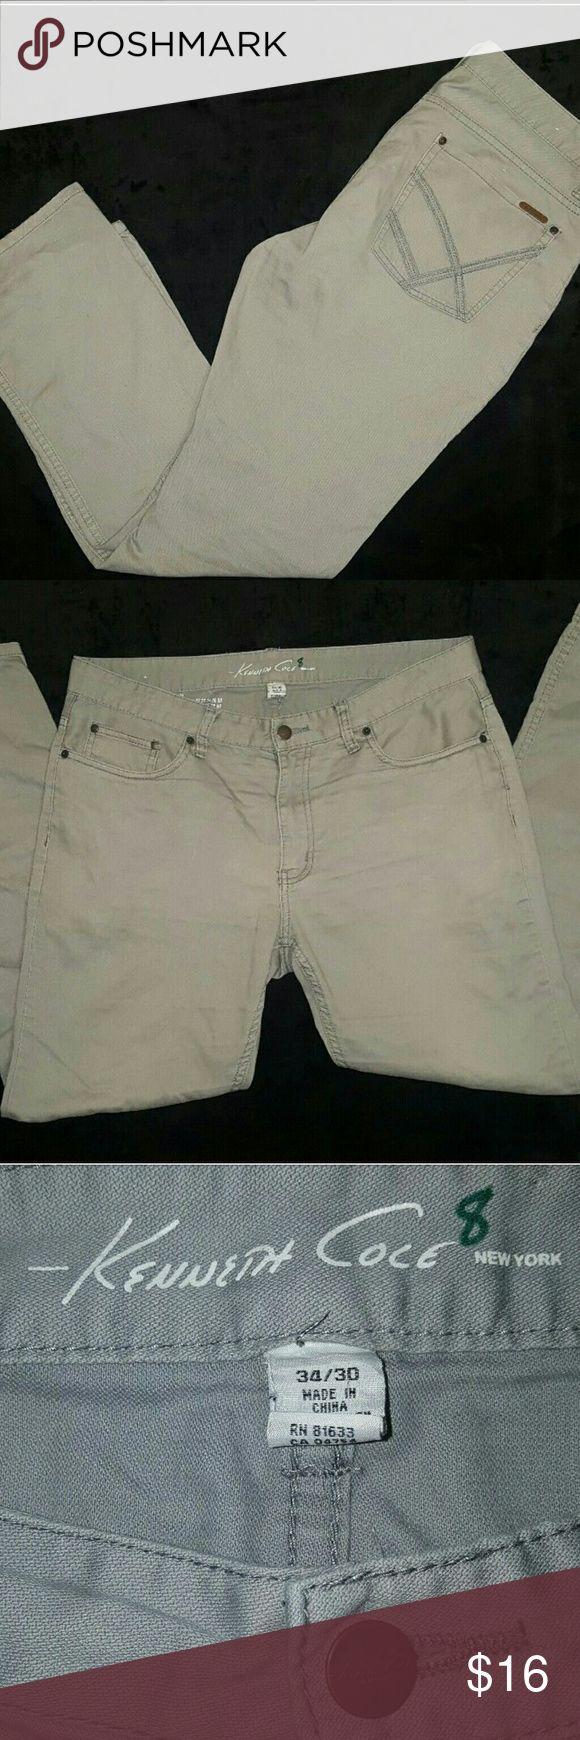 117 Best My Posh Closet Images On Pinterest Auction Daily Deals Lgs  Regular Fit Stripe Tee Blue Casual T Shirt Biru L Kenneth Cole Dress Rehearsal 34 30 Pants